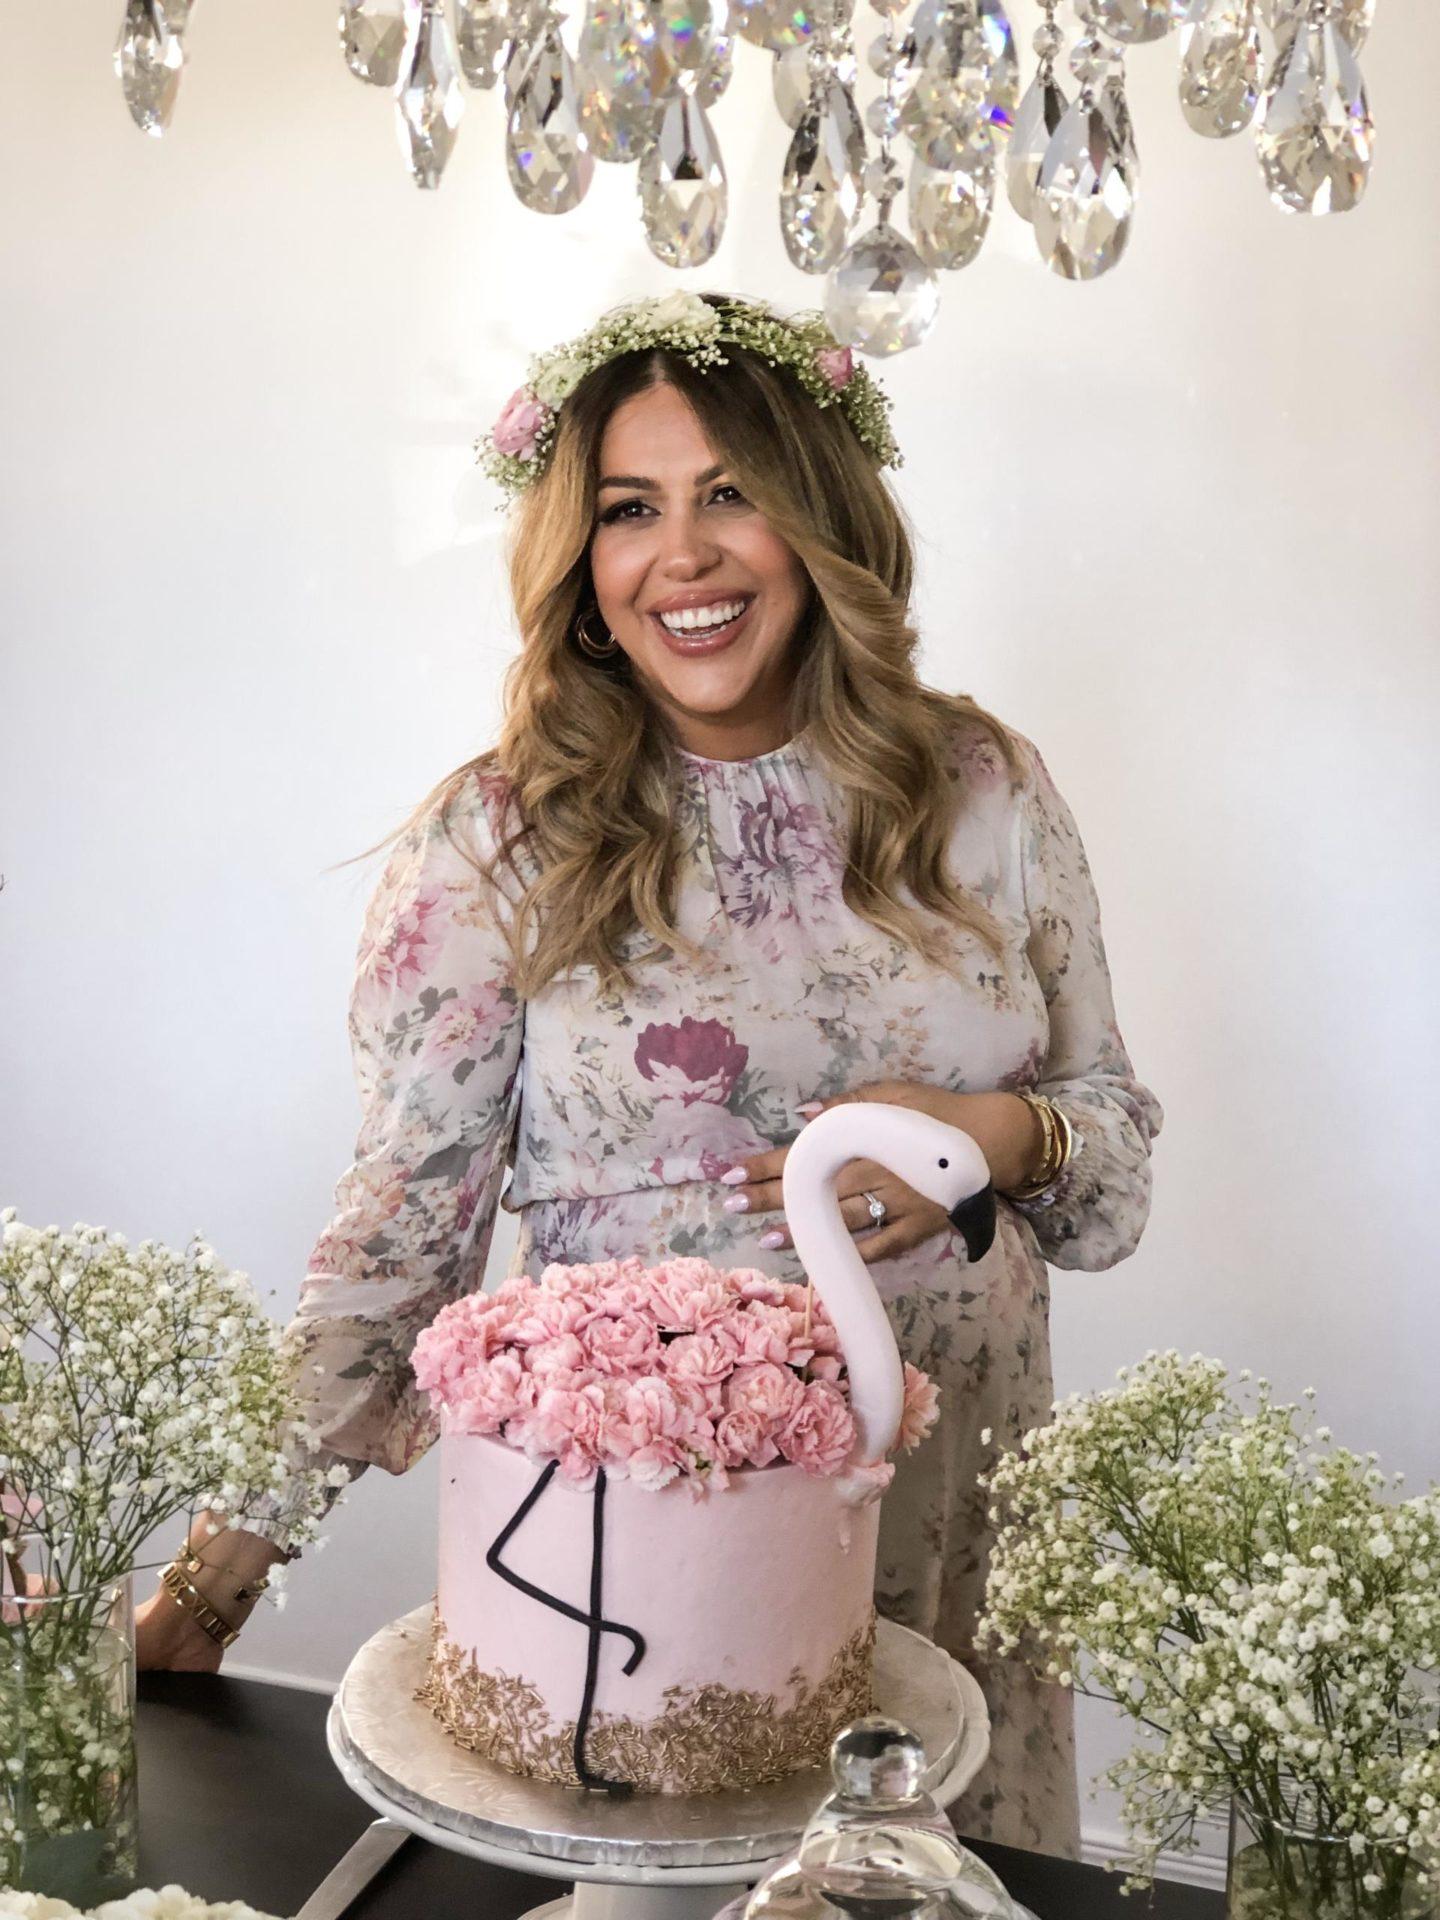 Tara Vassilev's baby shower